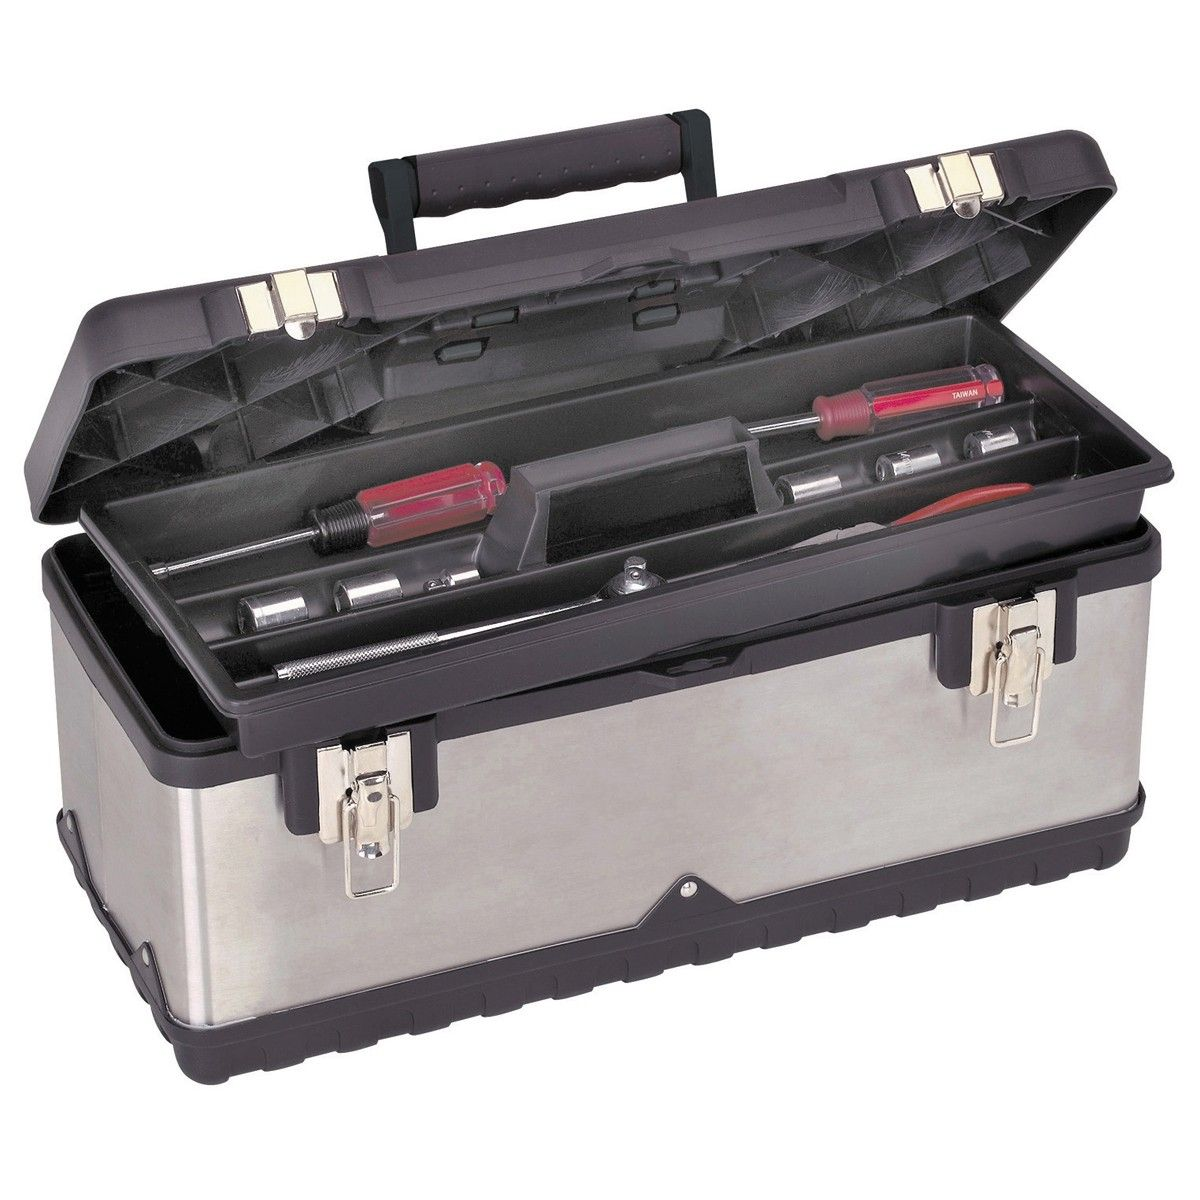 20 in. Stainless Steel Toolbox Tool box, Steel tool box